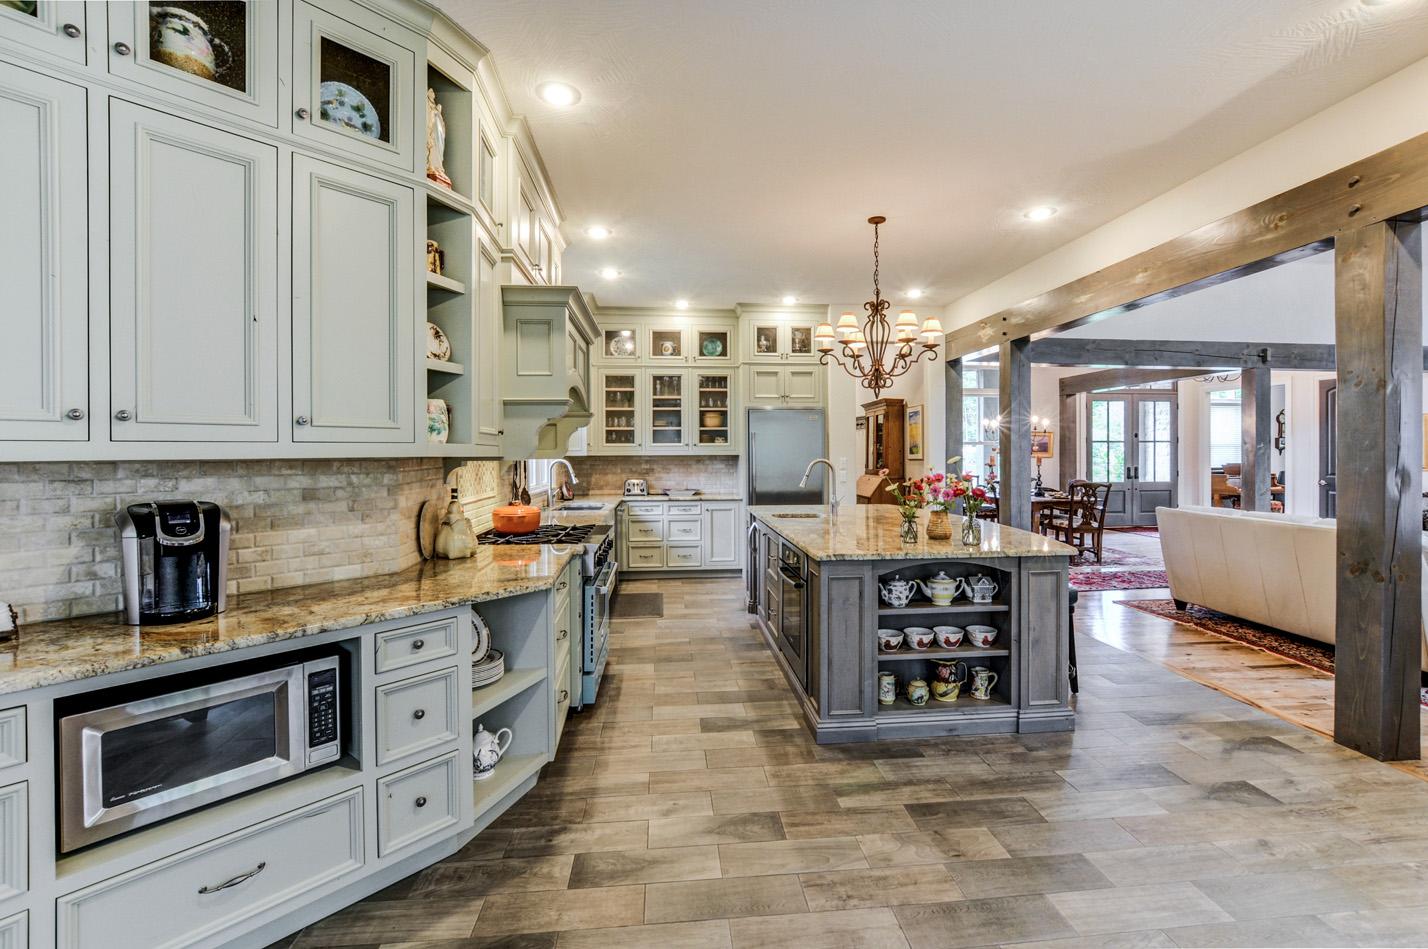 built-by-brett-custom-home-builders-springfield-mo-dunrobin-010.jpg